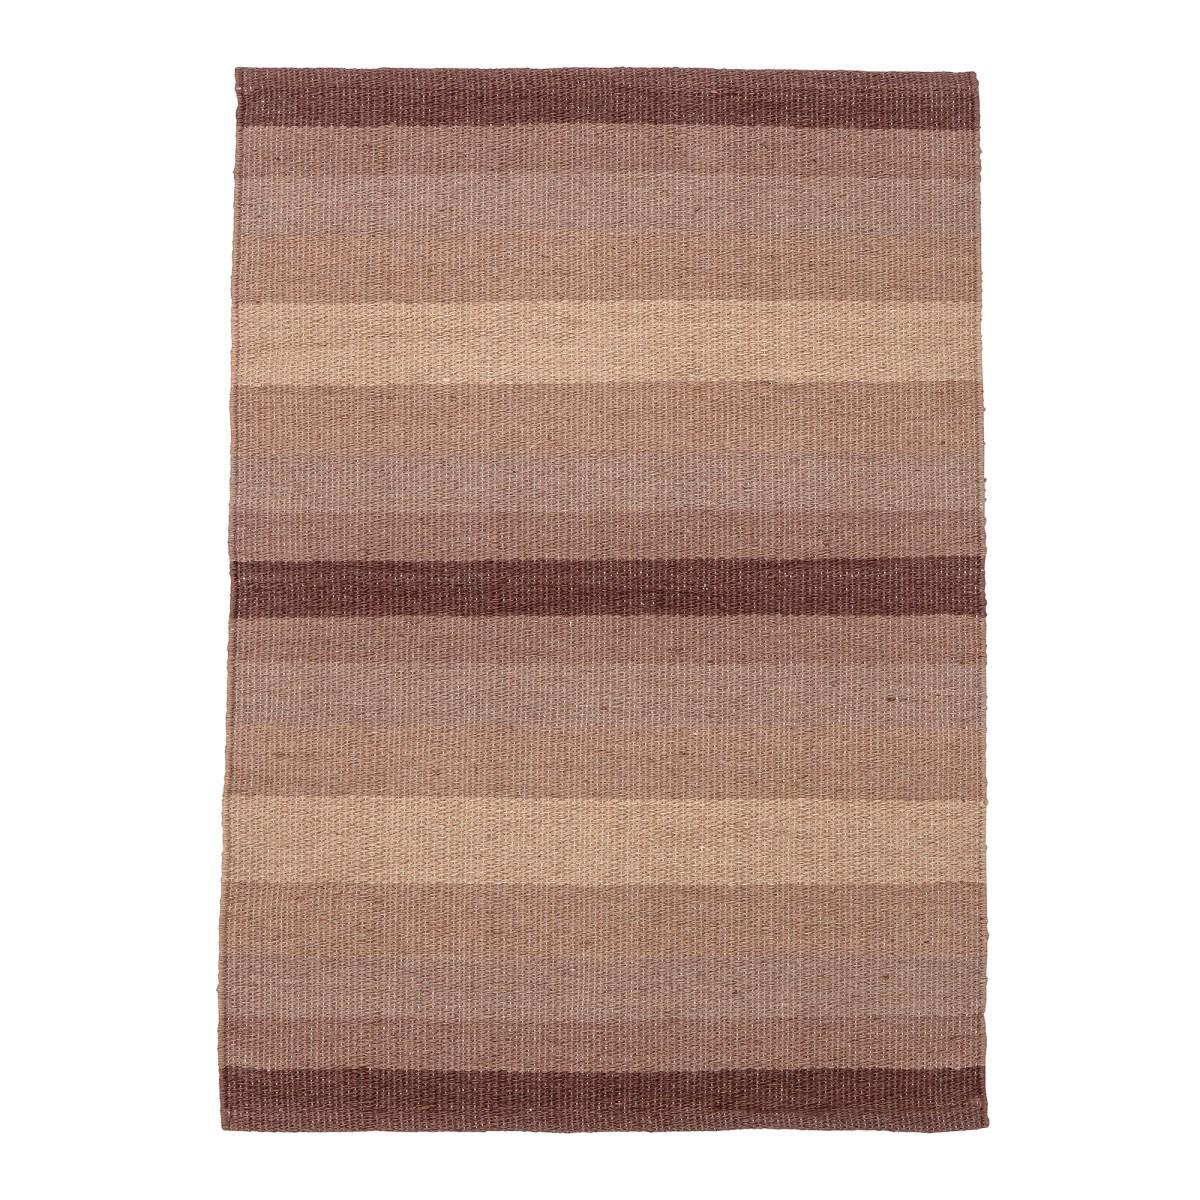 Jutový koberec 90x60 cm_0